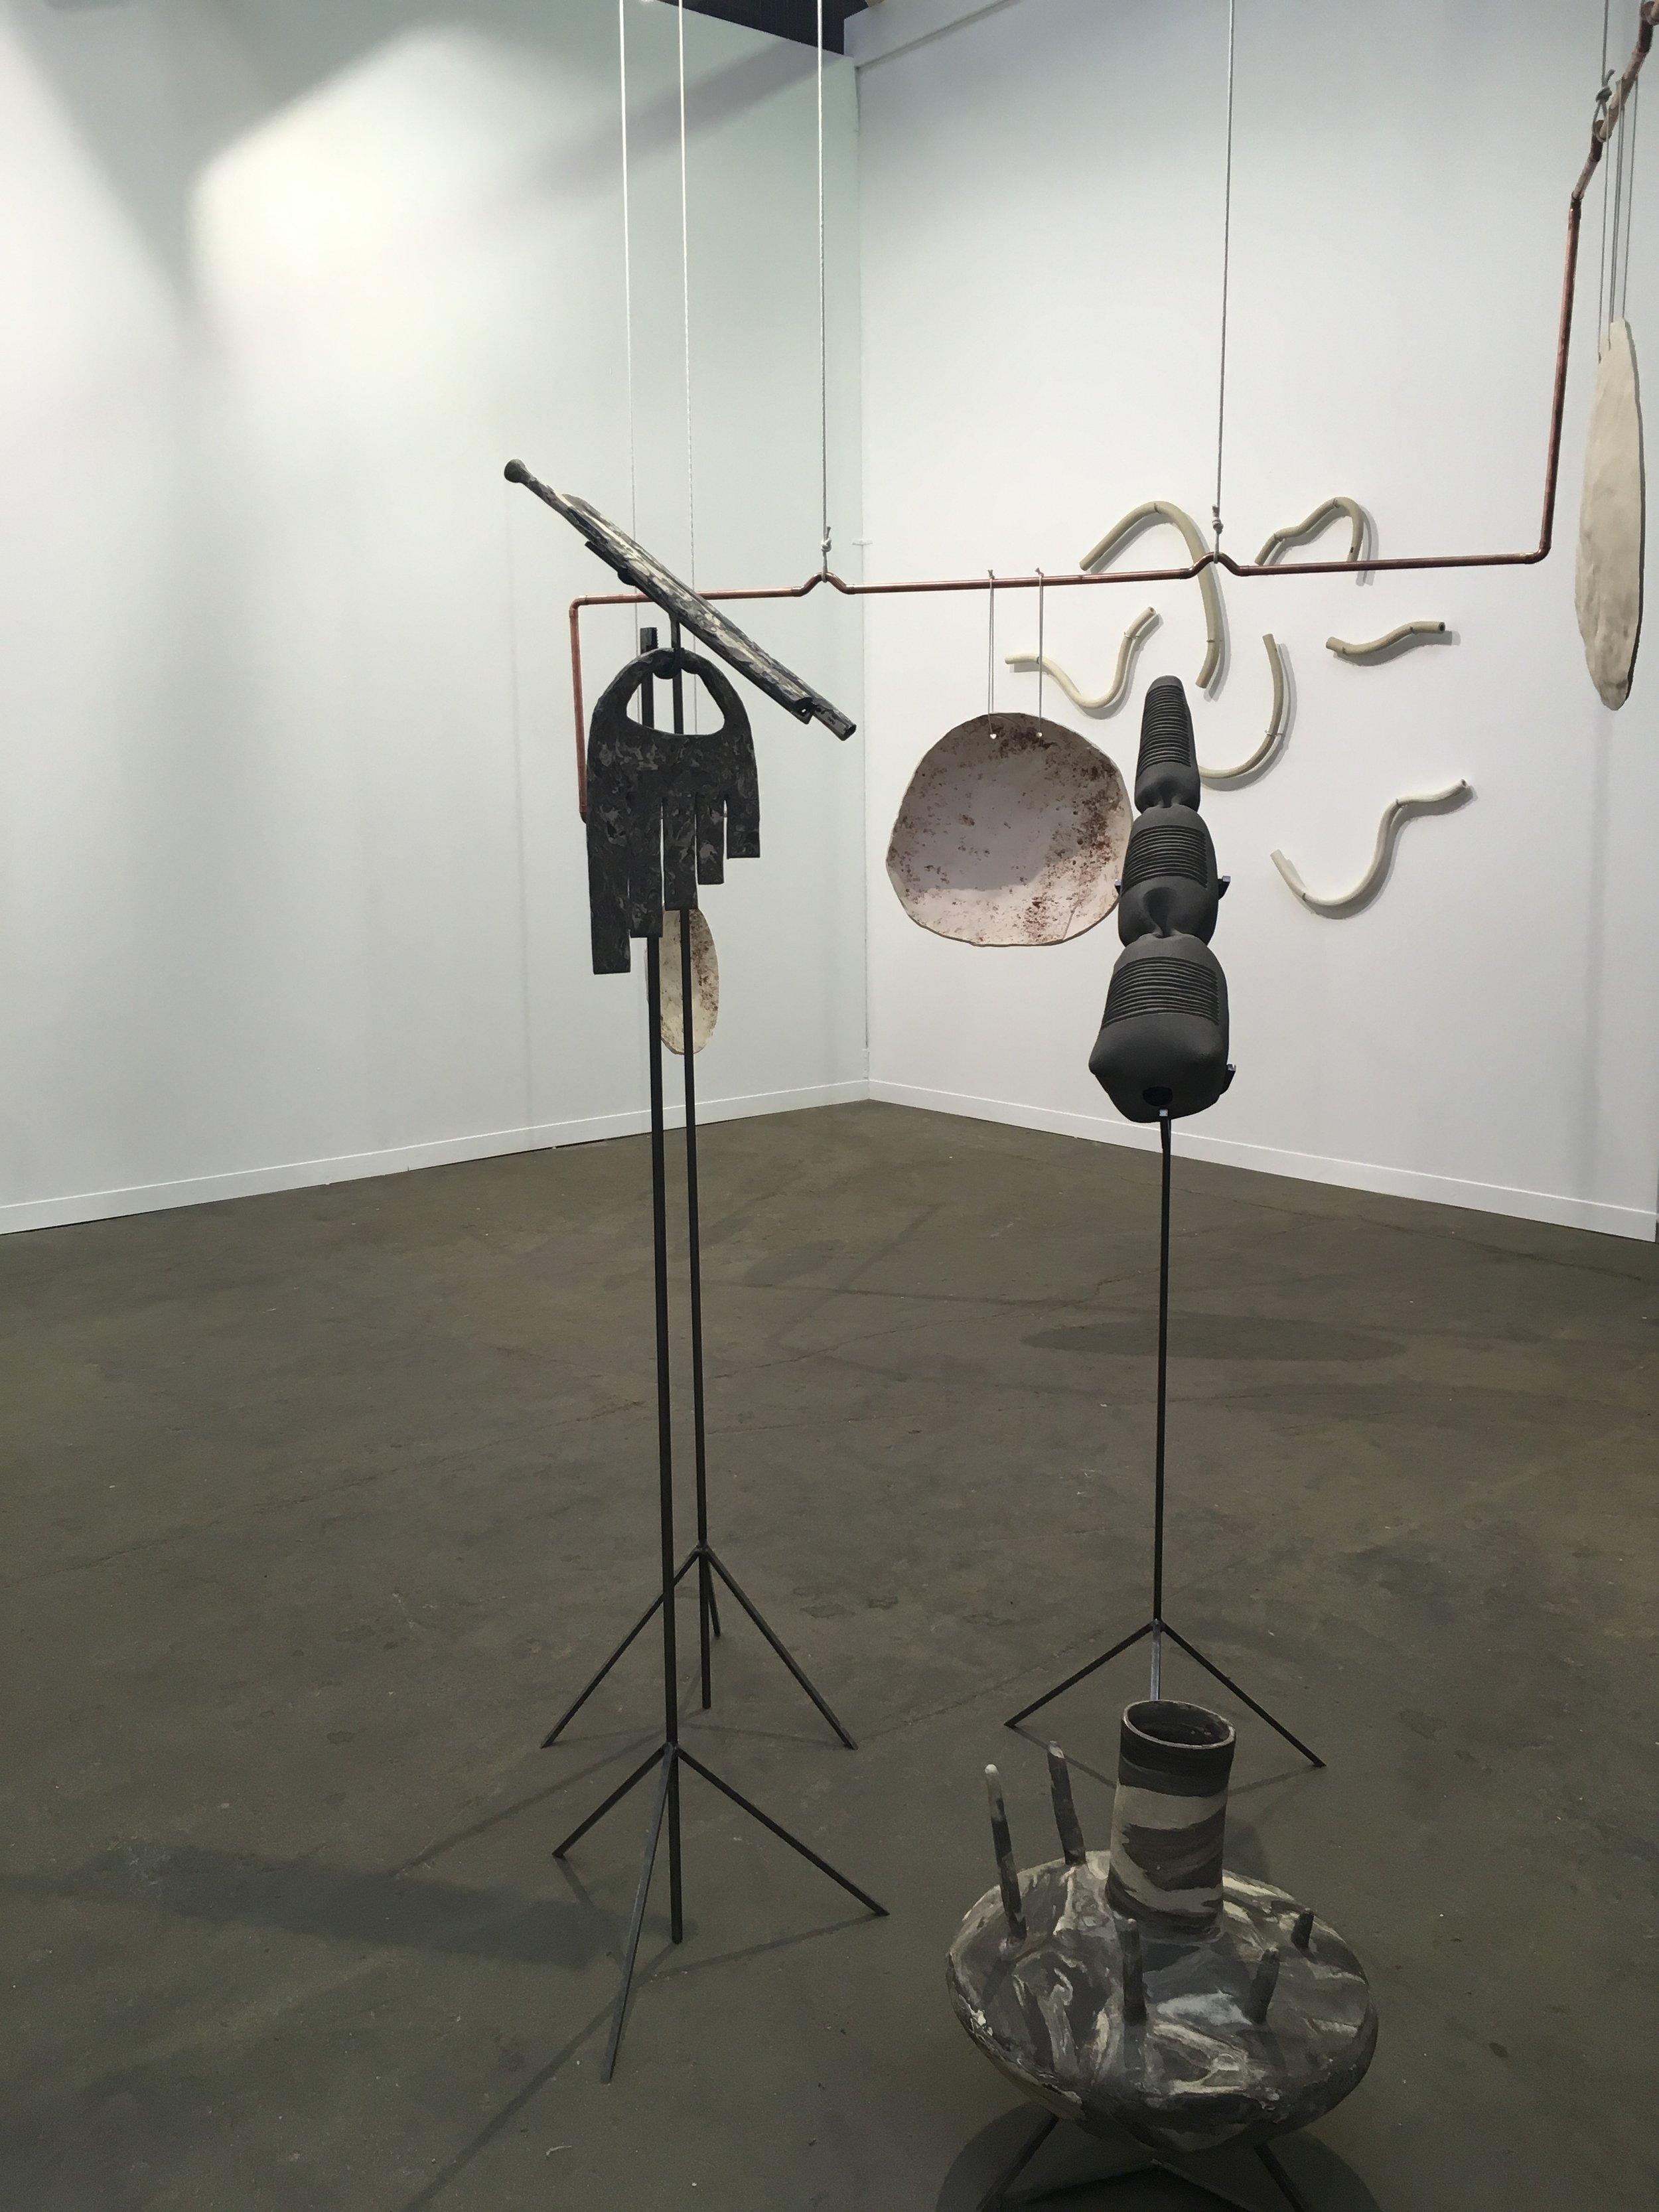 Maika Garnica / Maronne De Cannière, Antwerp